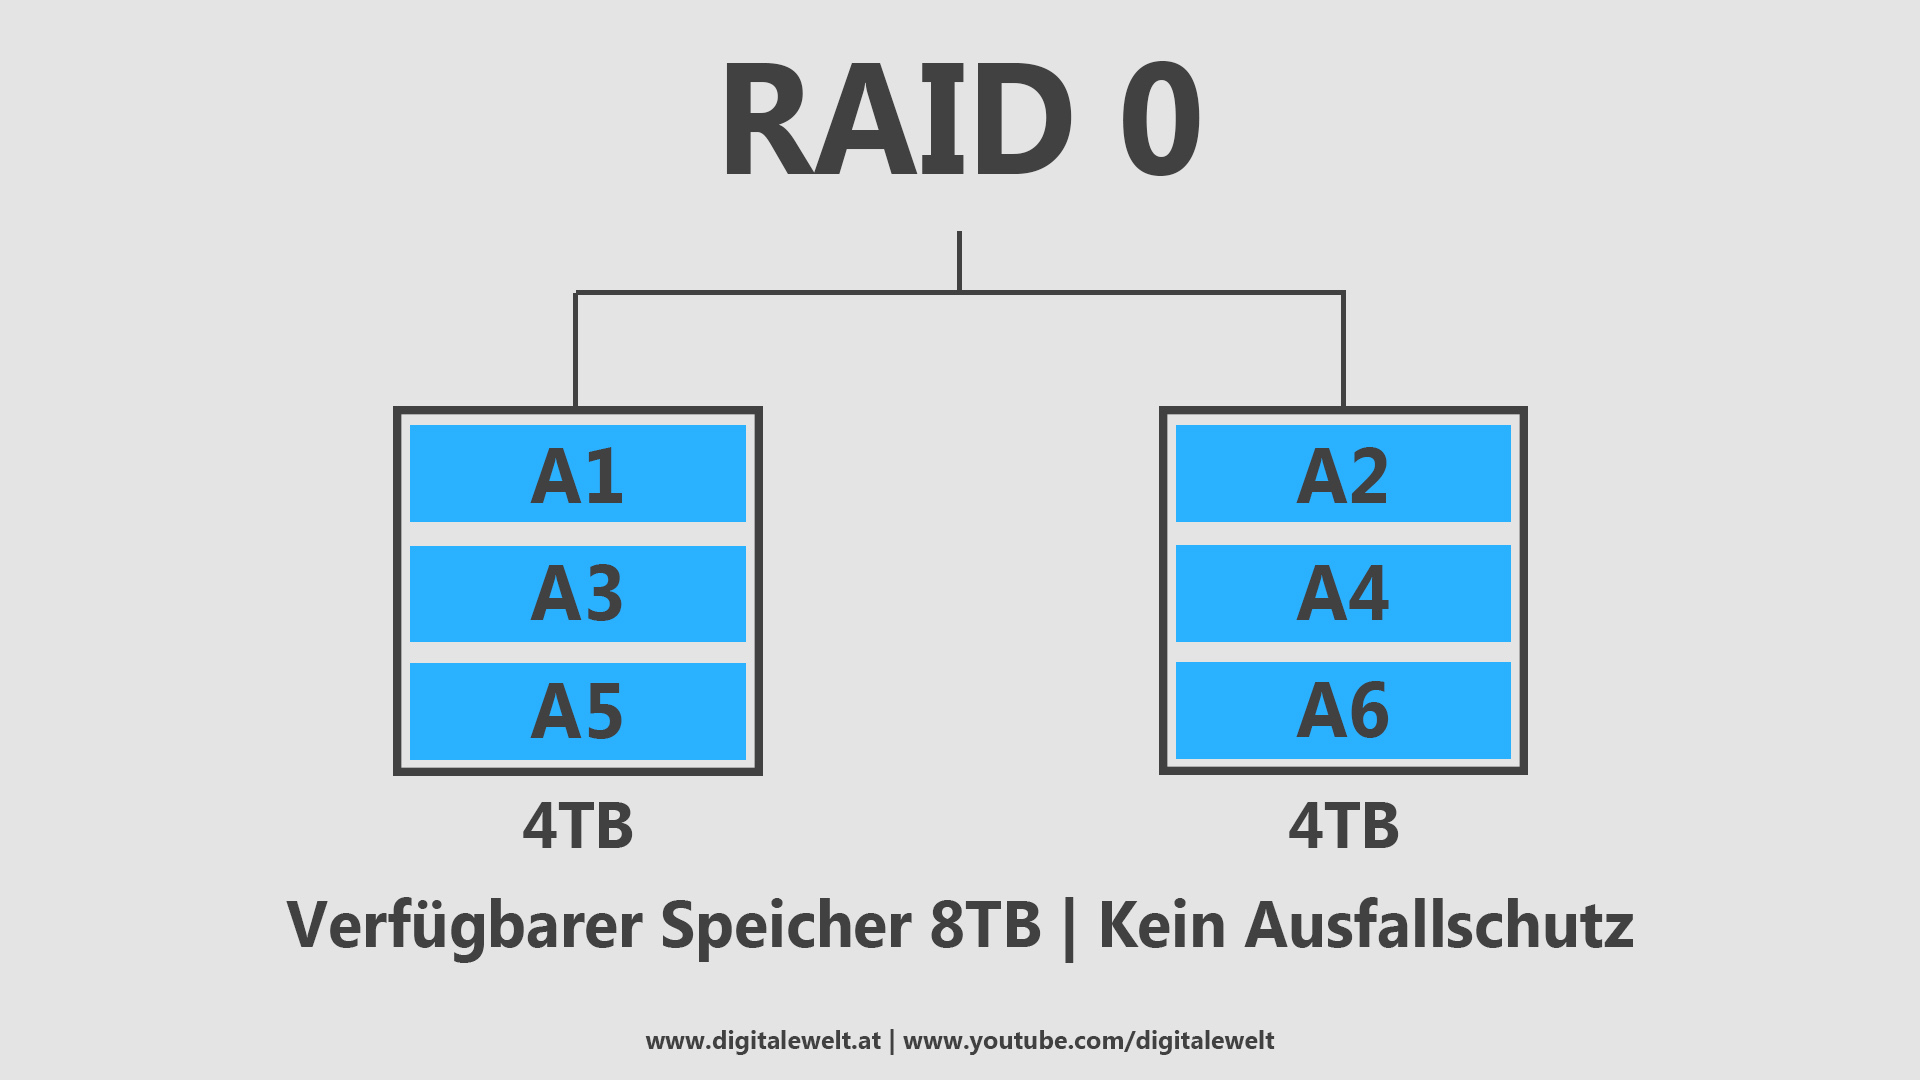 RAID-Systeme - RAID 0